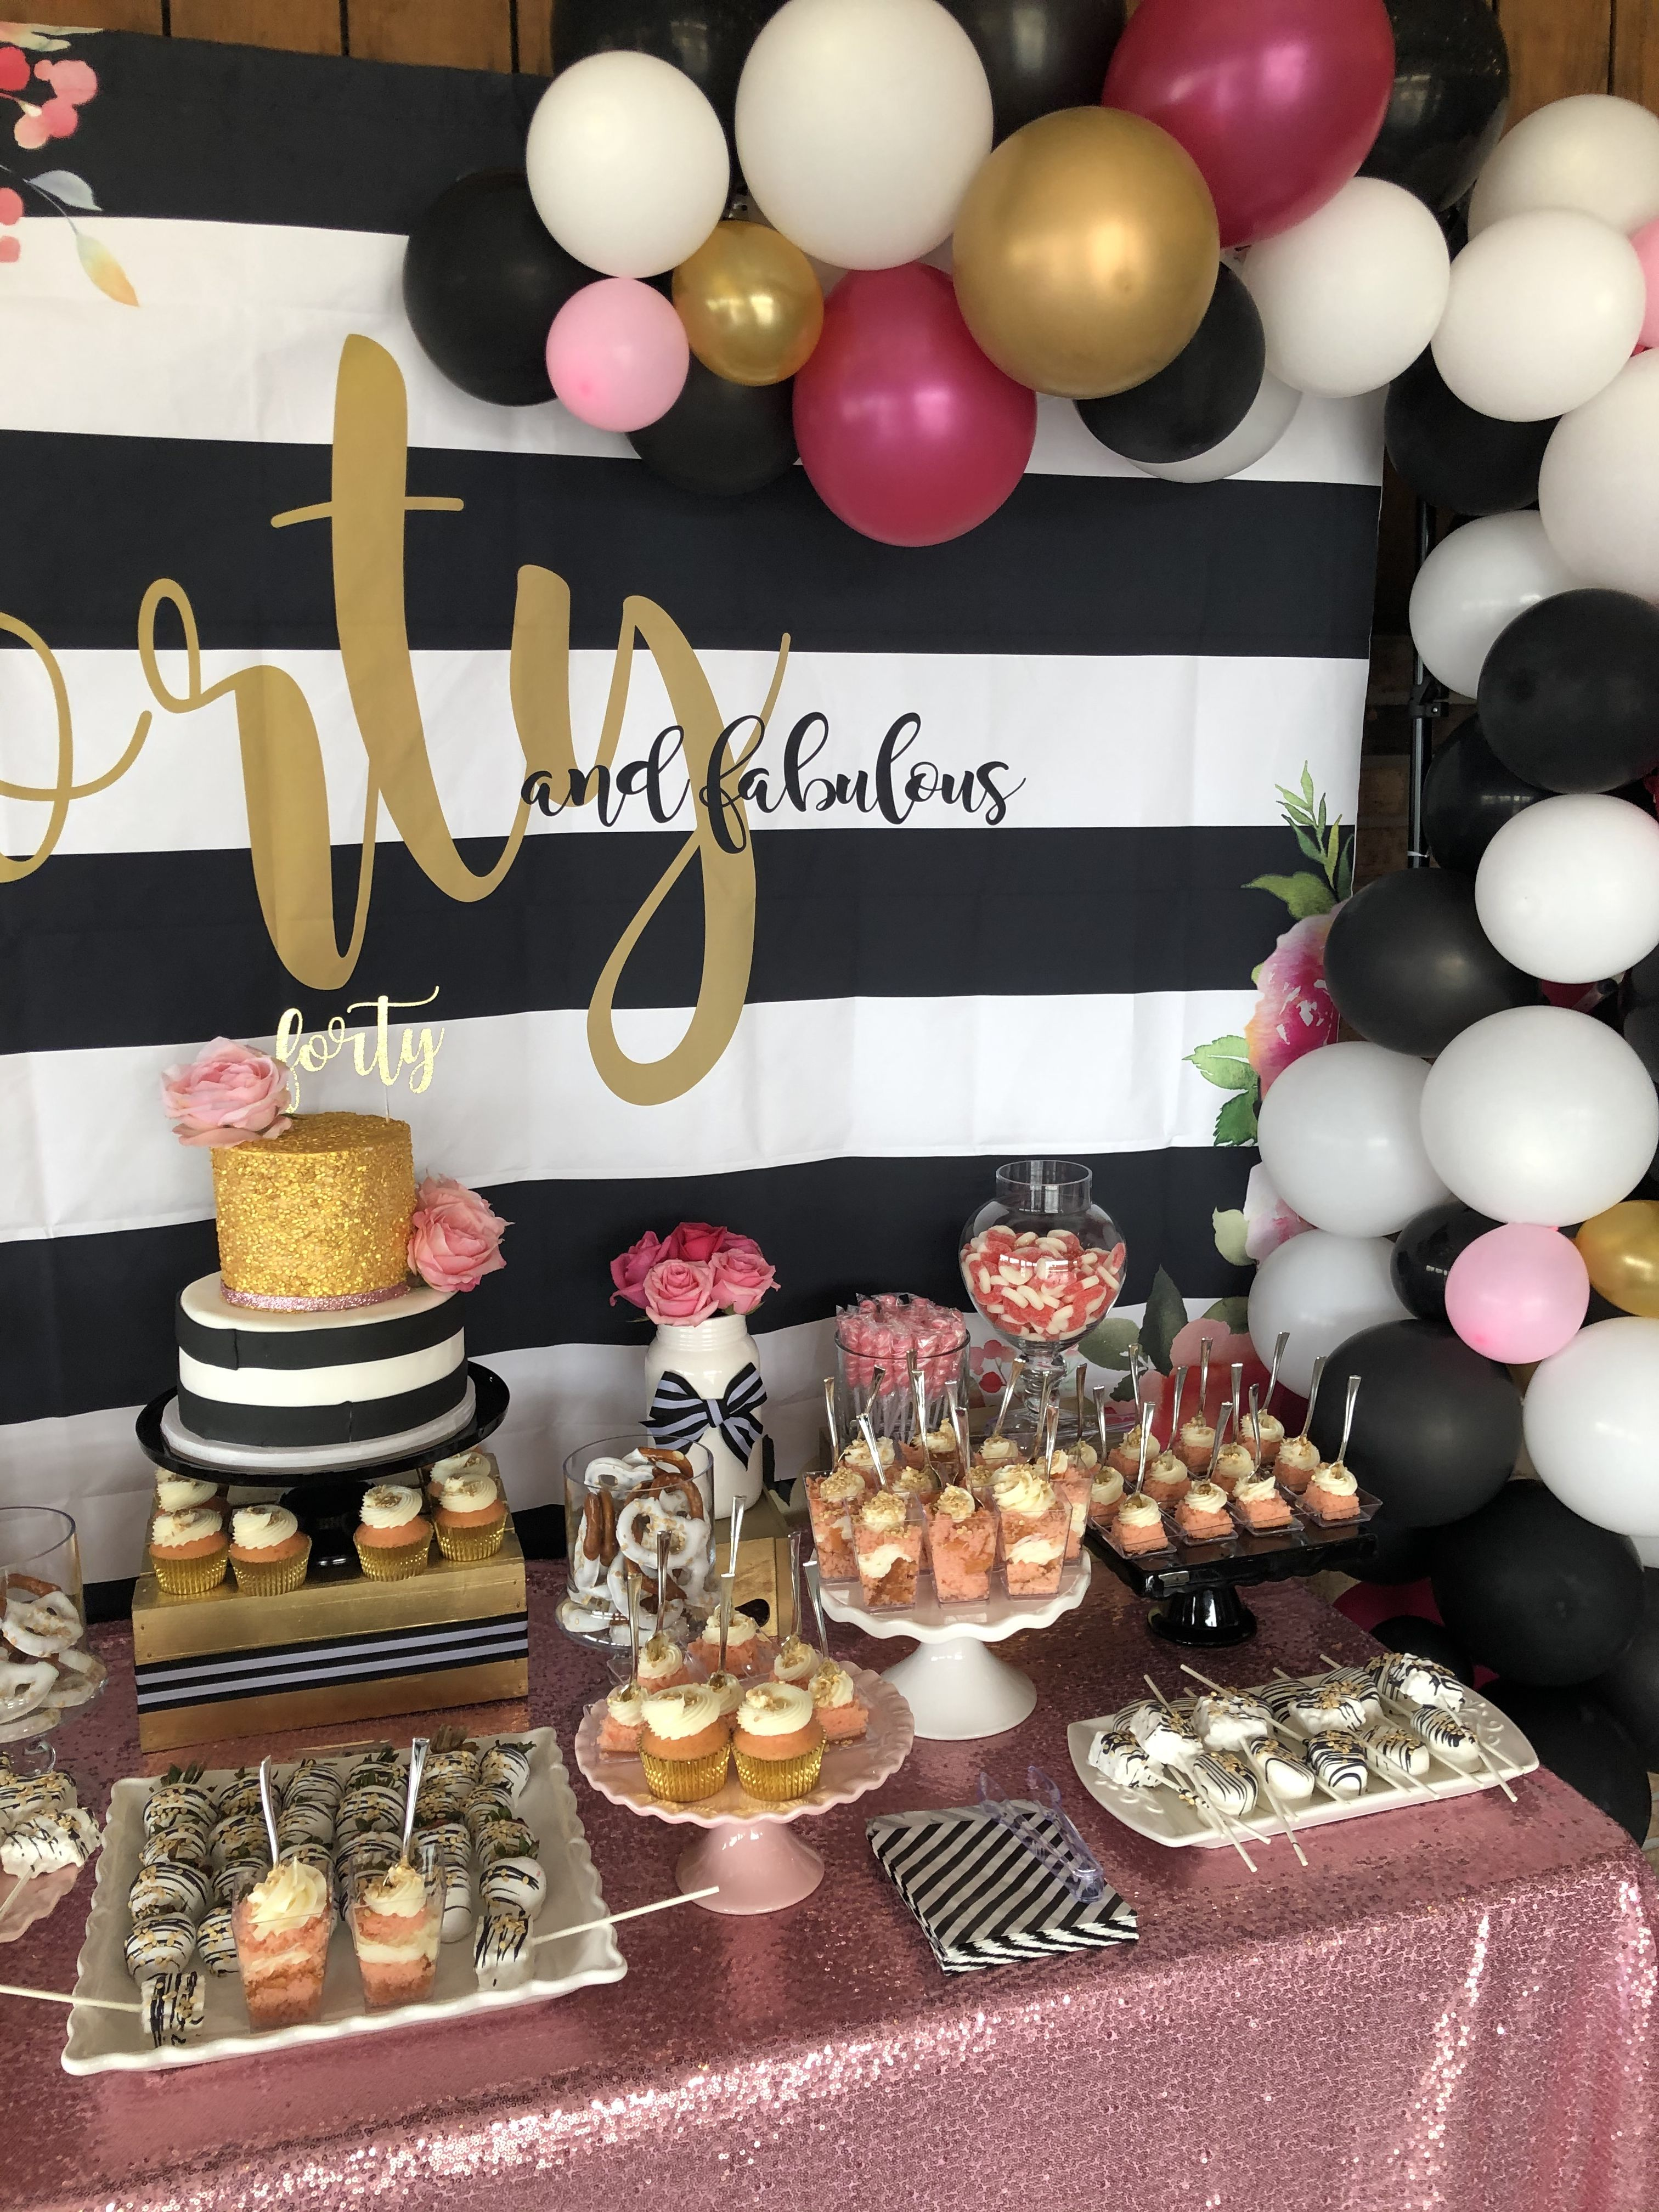 Kate Spade Birthday 40th Birthday For Women 40th Birthday Party Themes Birthday [ 4032 x 3024 Pixel ]